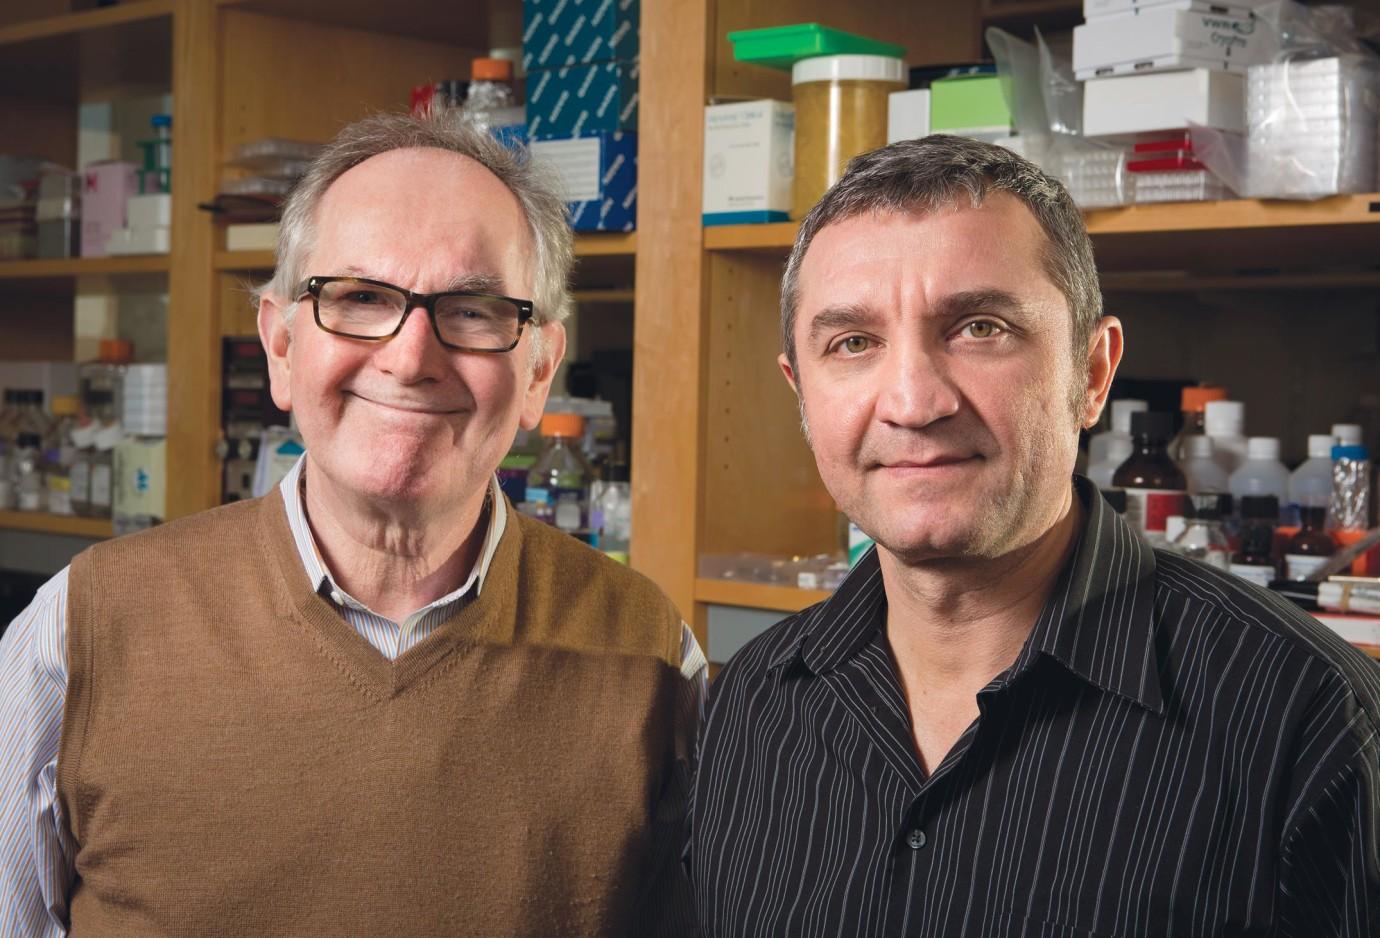 Richard Flavell (left) and Ruslan Medzhitov